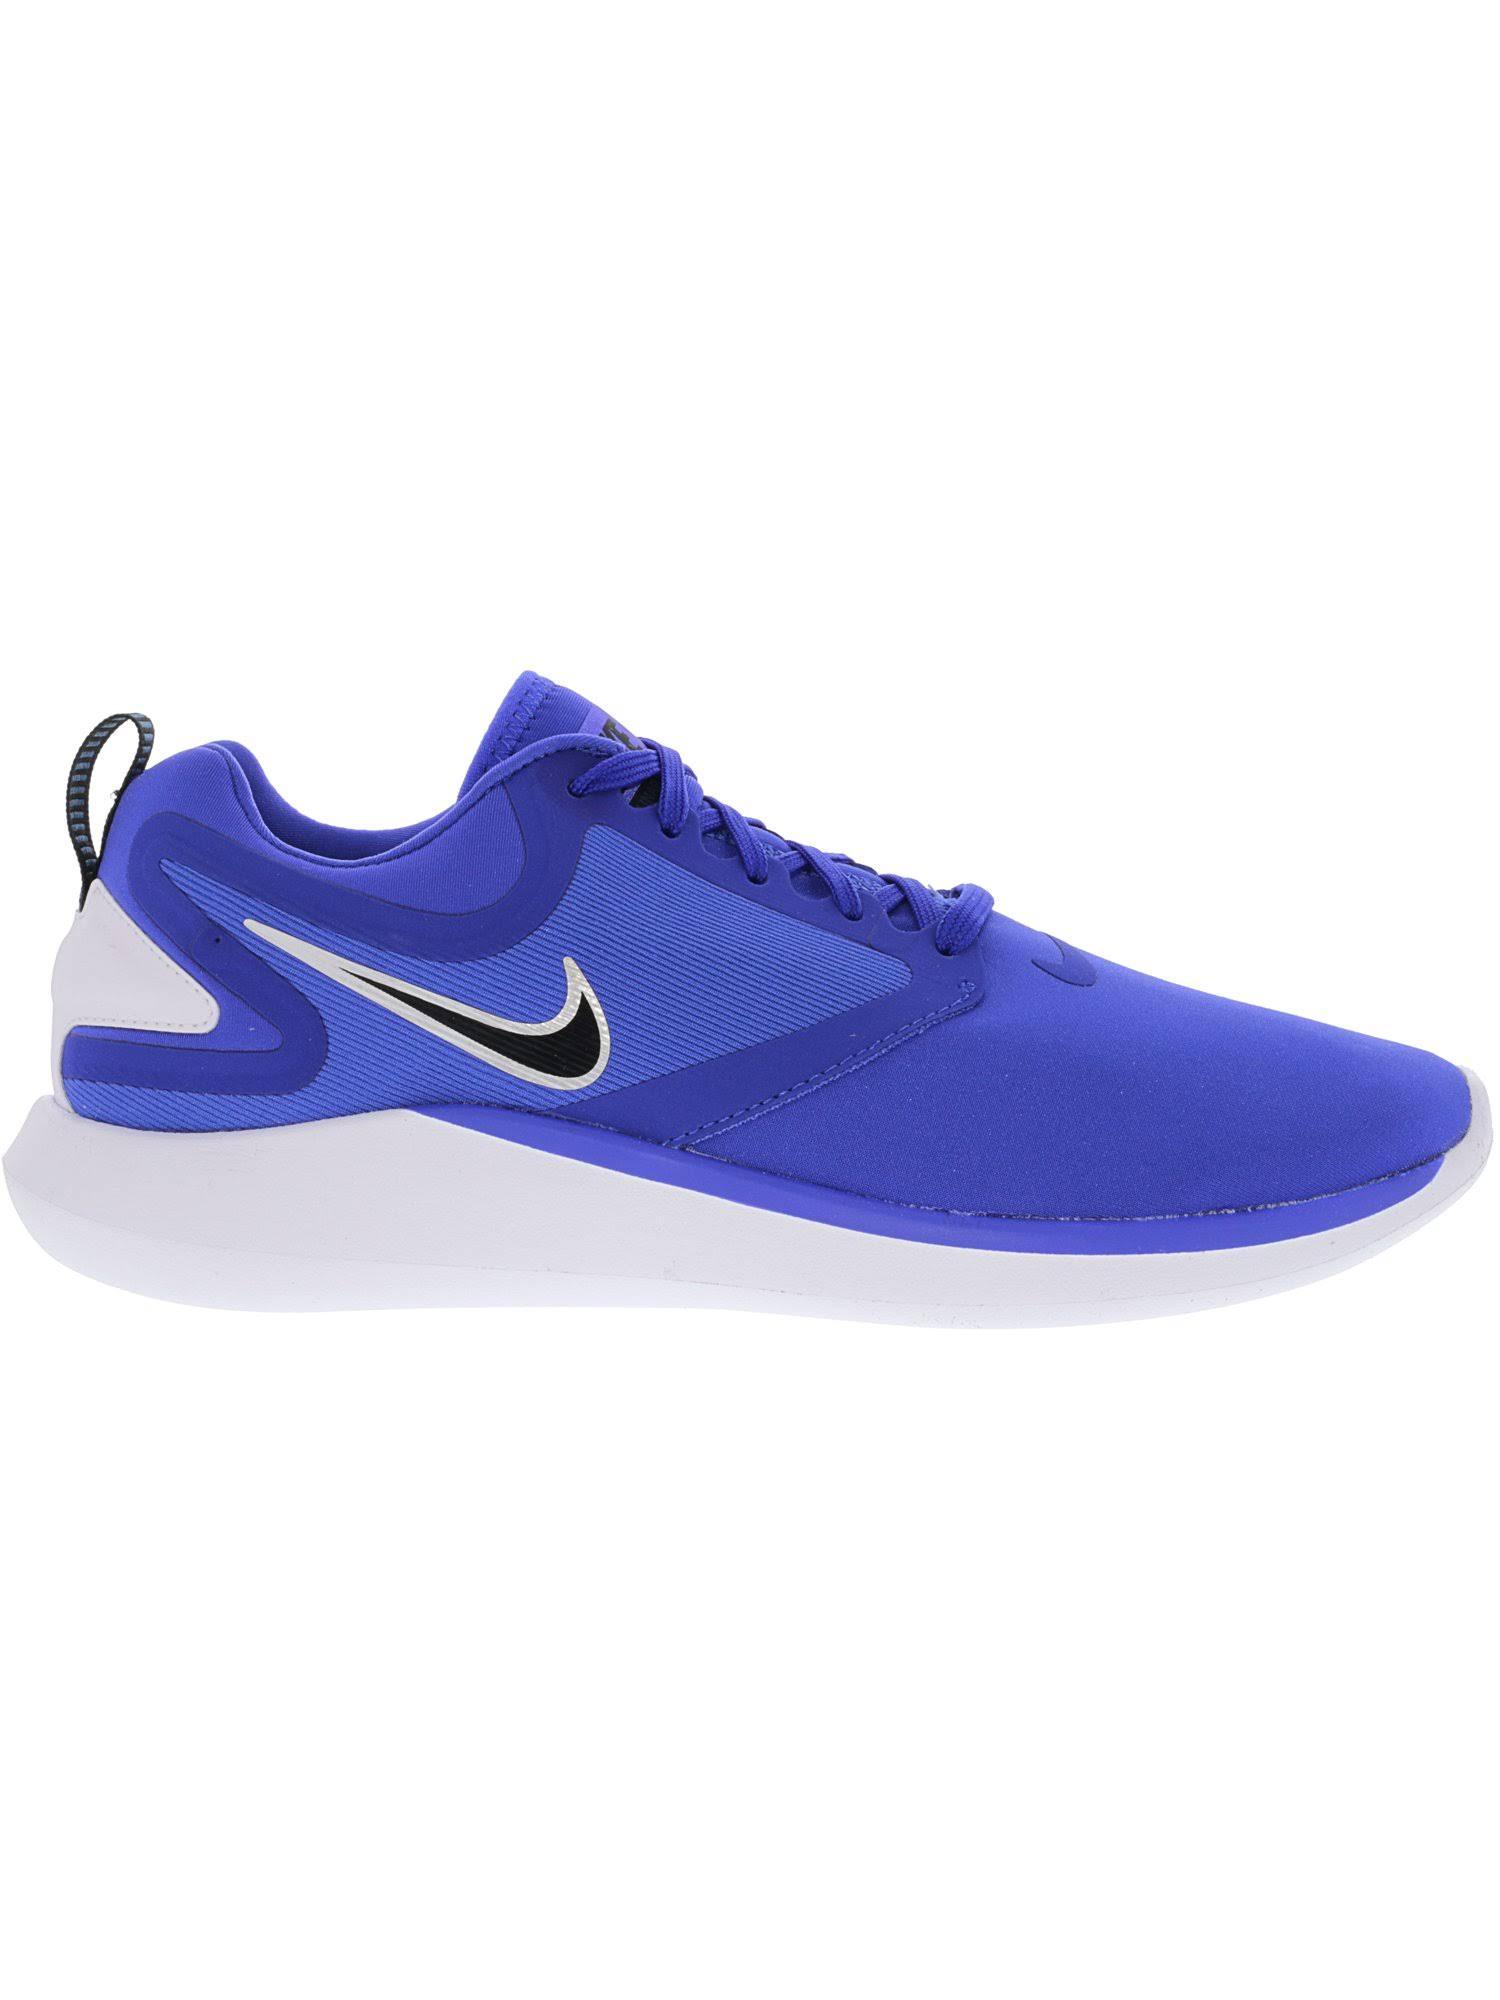 Buty 12 Racer Nike Biegania Black Do Force Lunarsolo Rozmiar Męskie Aa4079406 Blue 0cq4E